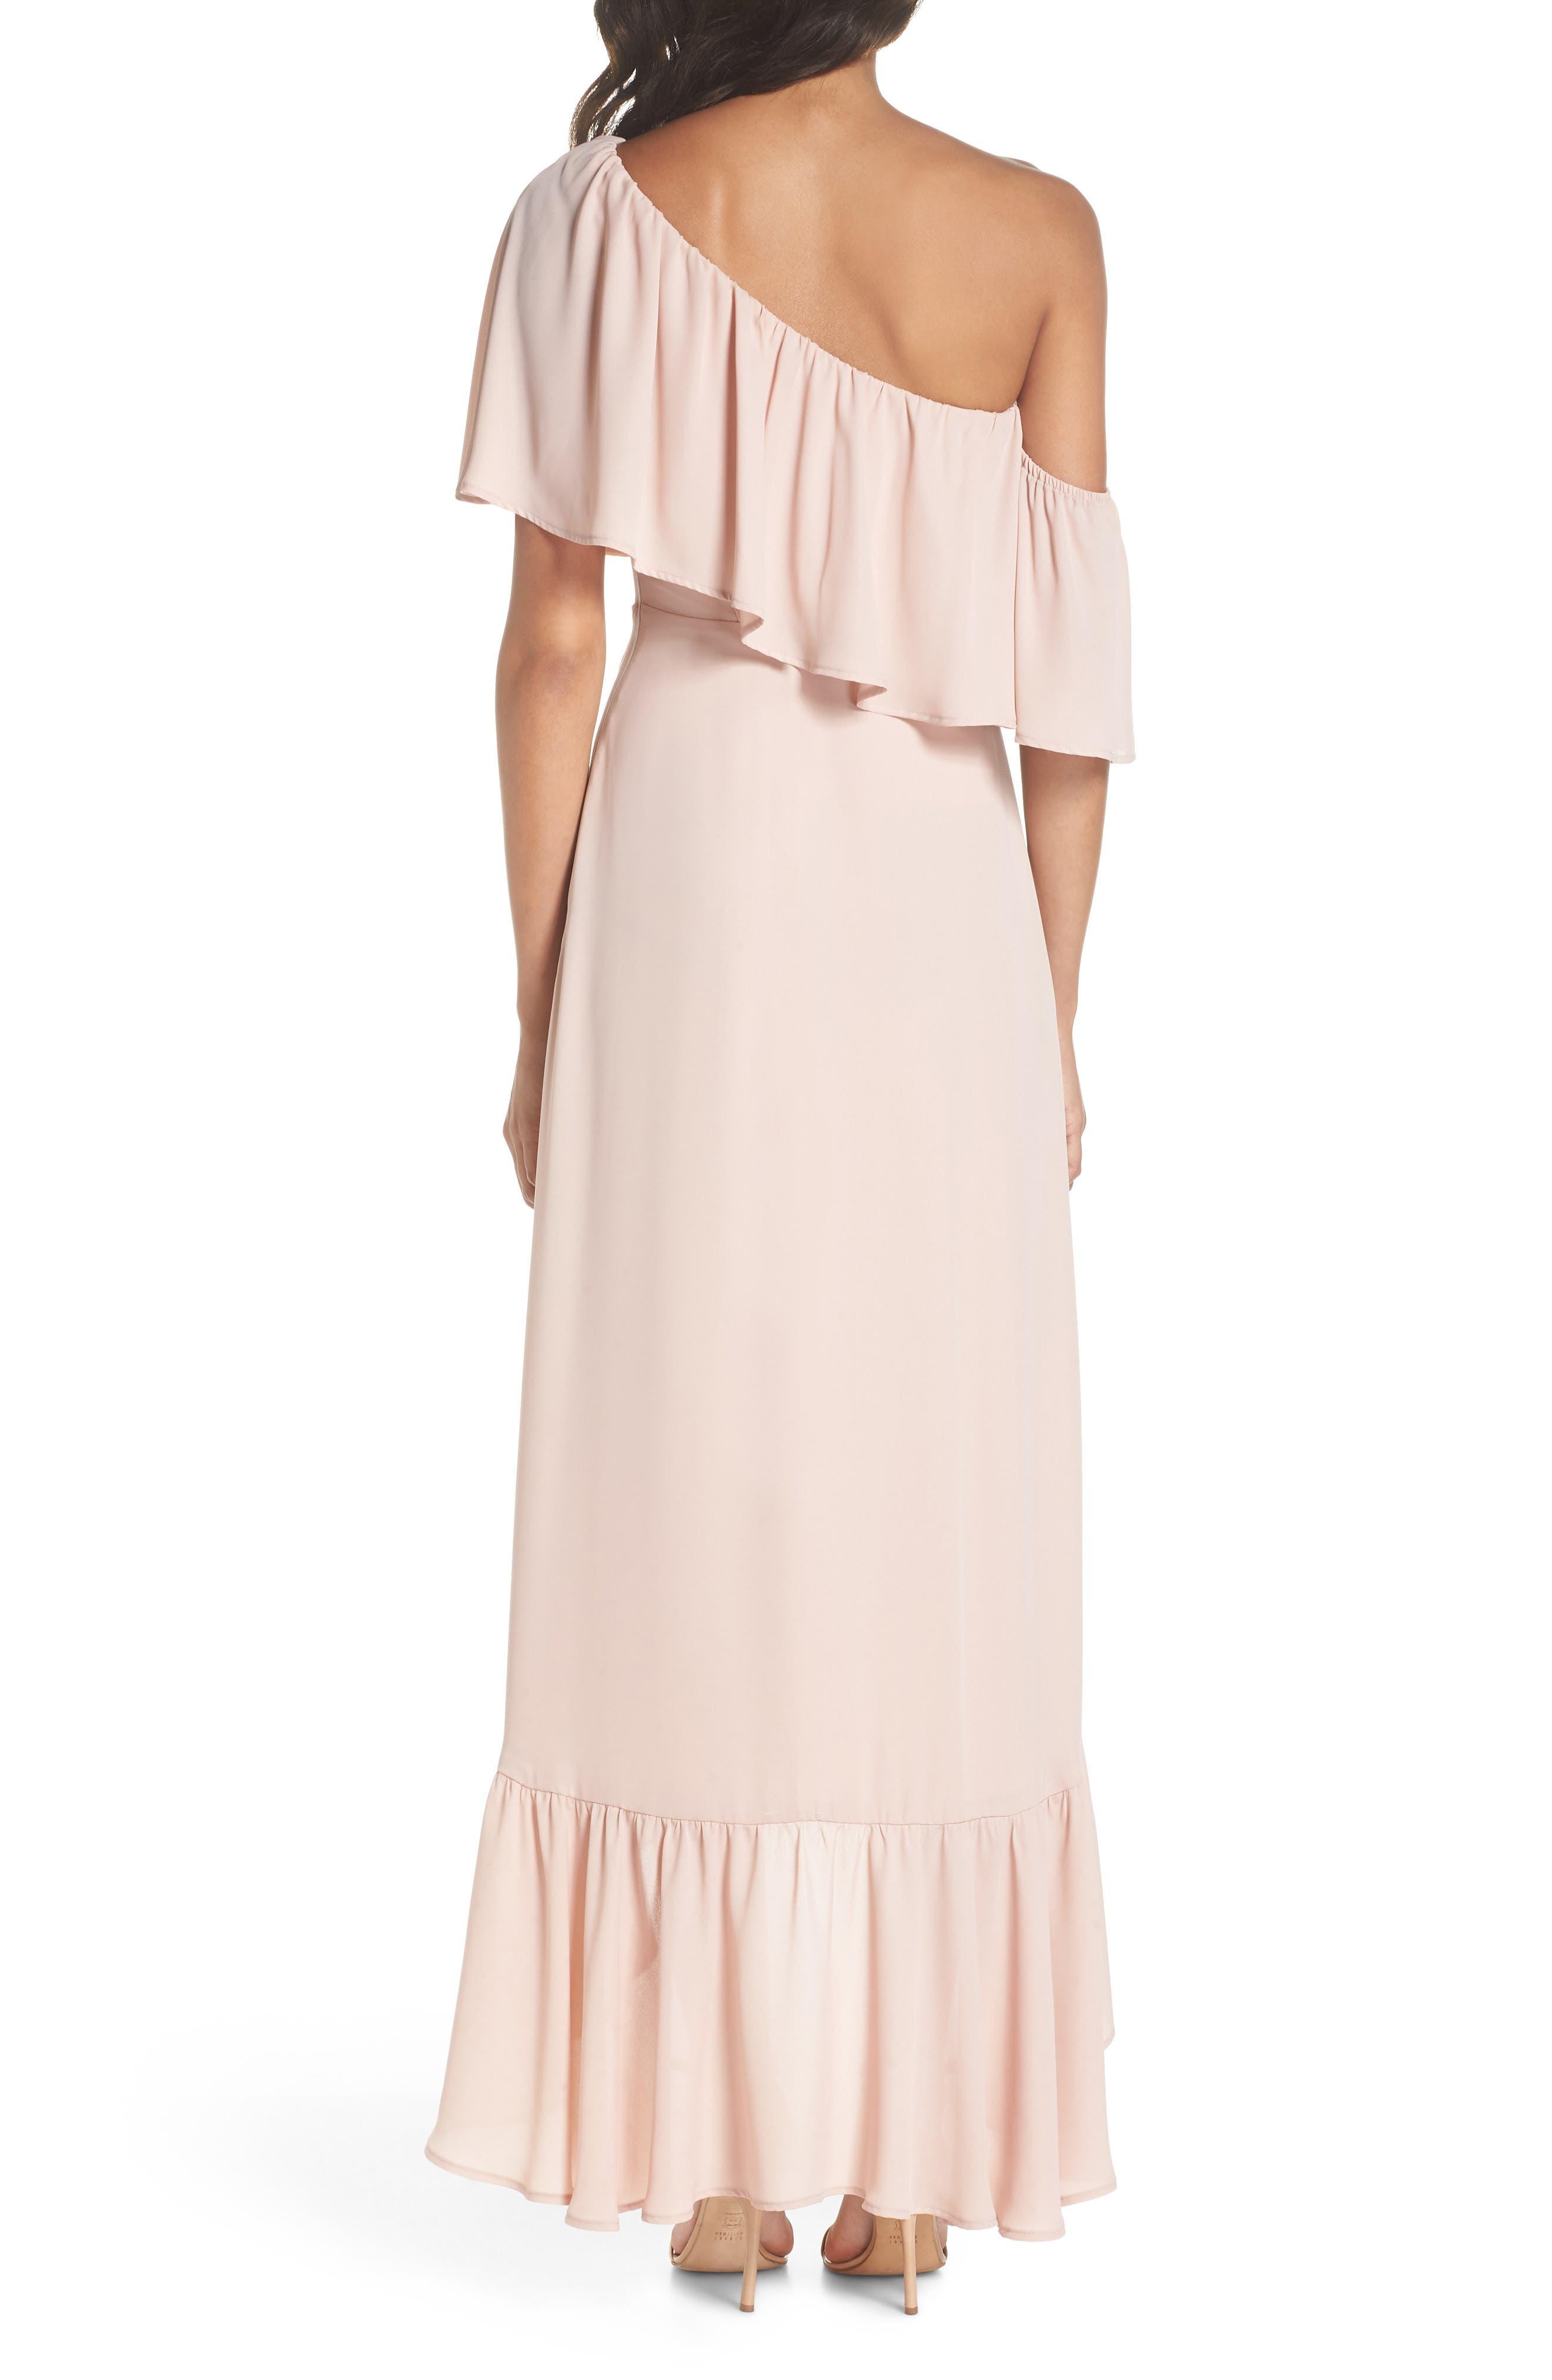 Tango Ruffle Gown,                             Alternate thumbnail 2, color,                             Dusty Blush Crisp